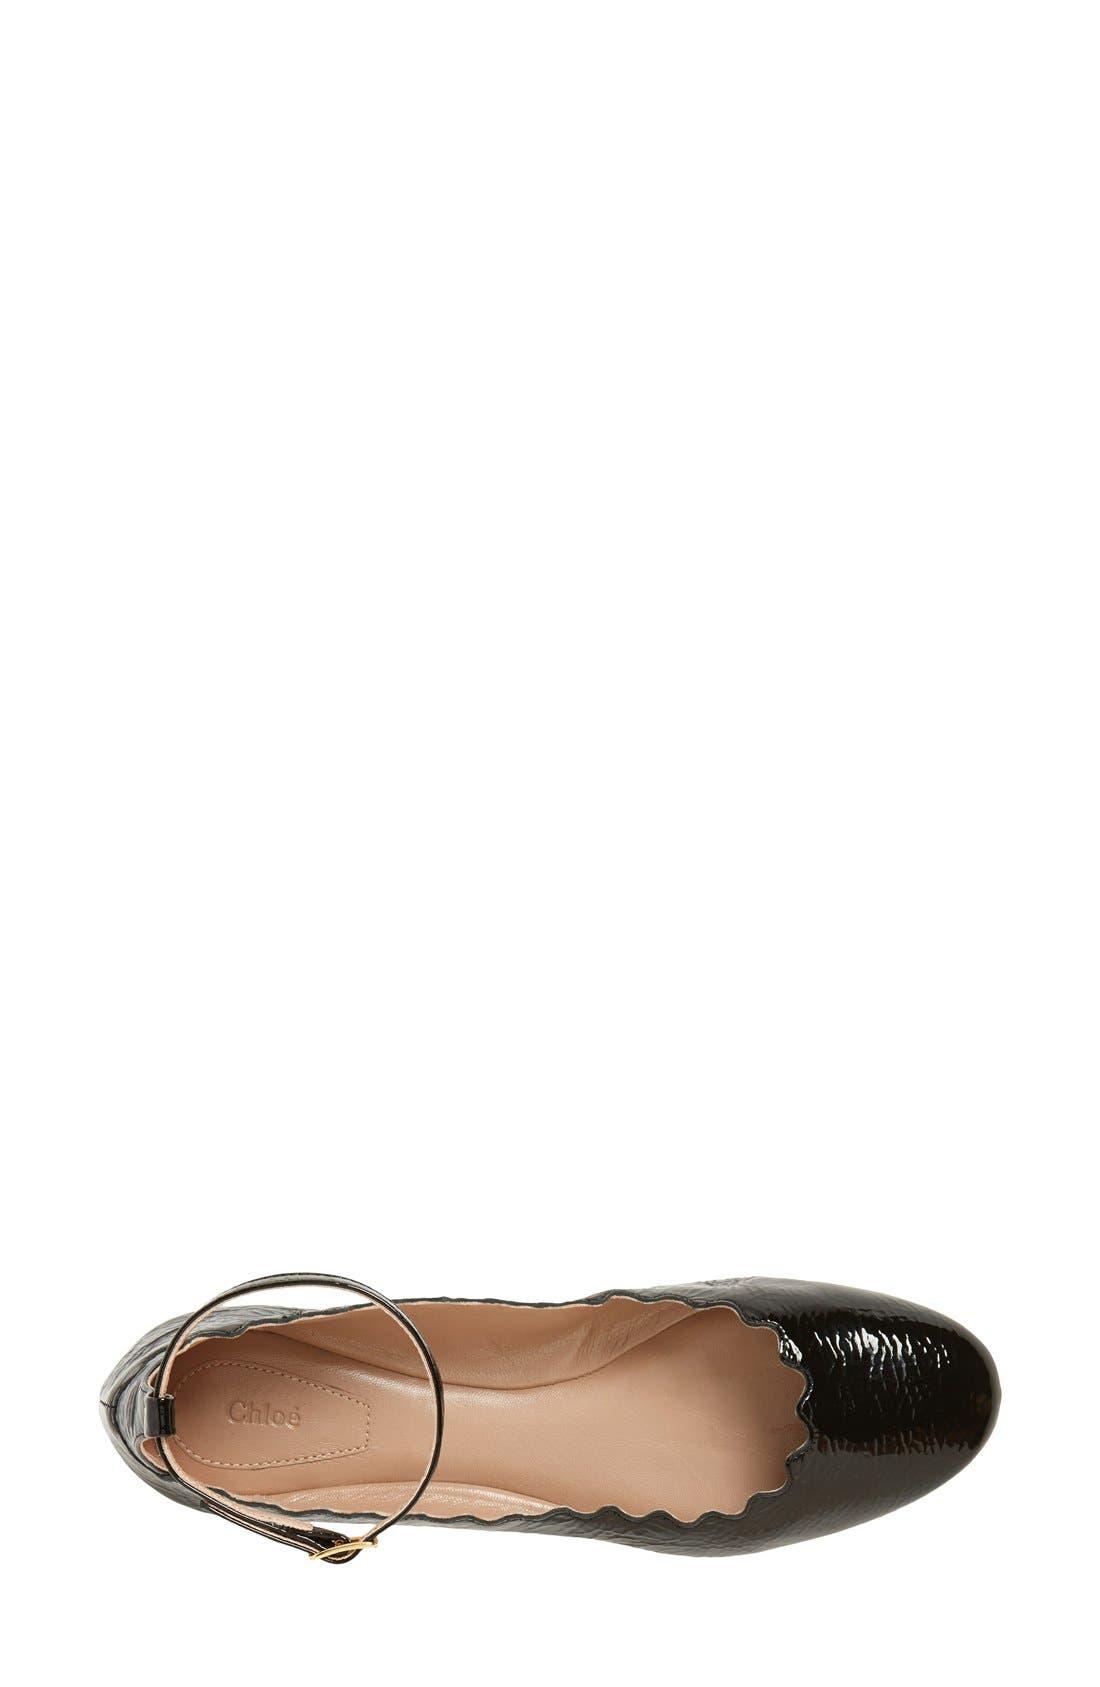 Alternate Image 3  - Chloé 'Laurent' Ankle Strap Flat (Women)